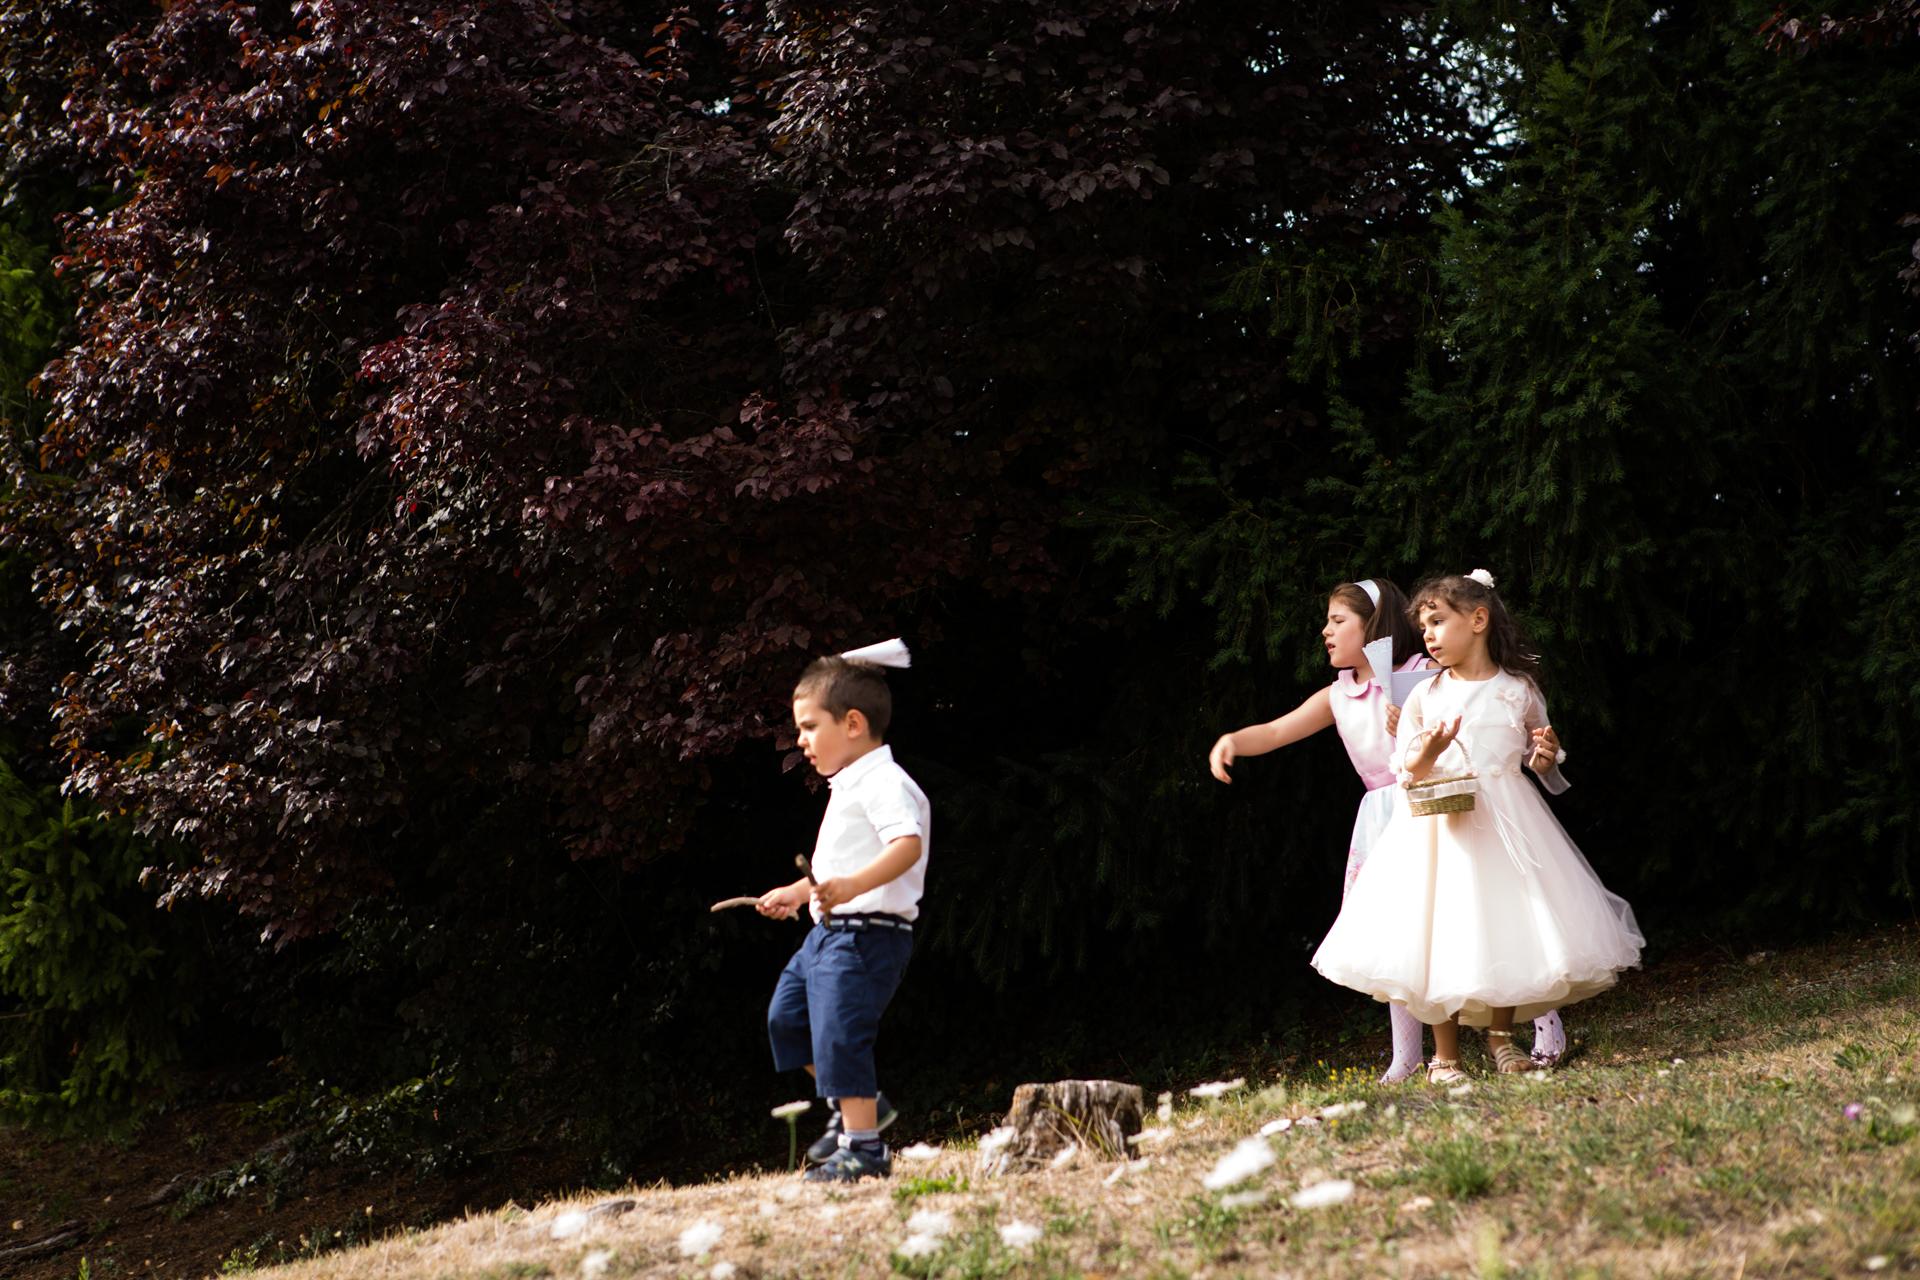 photographe-mariage-oise-paris-chantilly-senlis-keith-flament0090